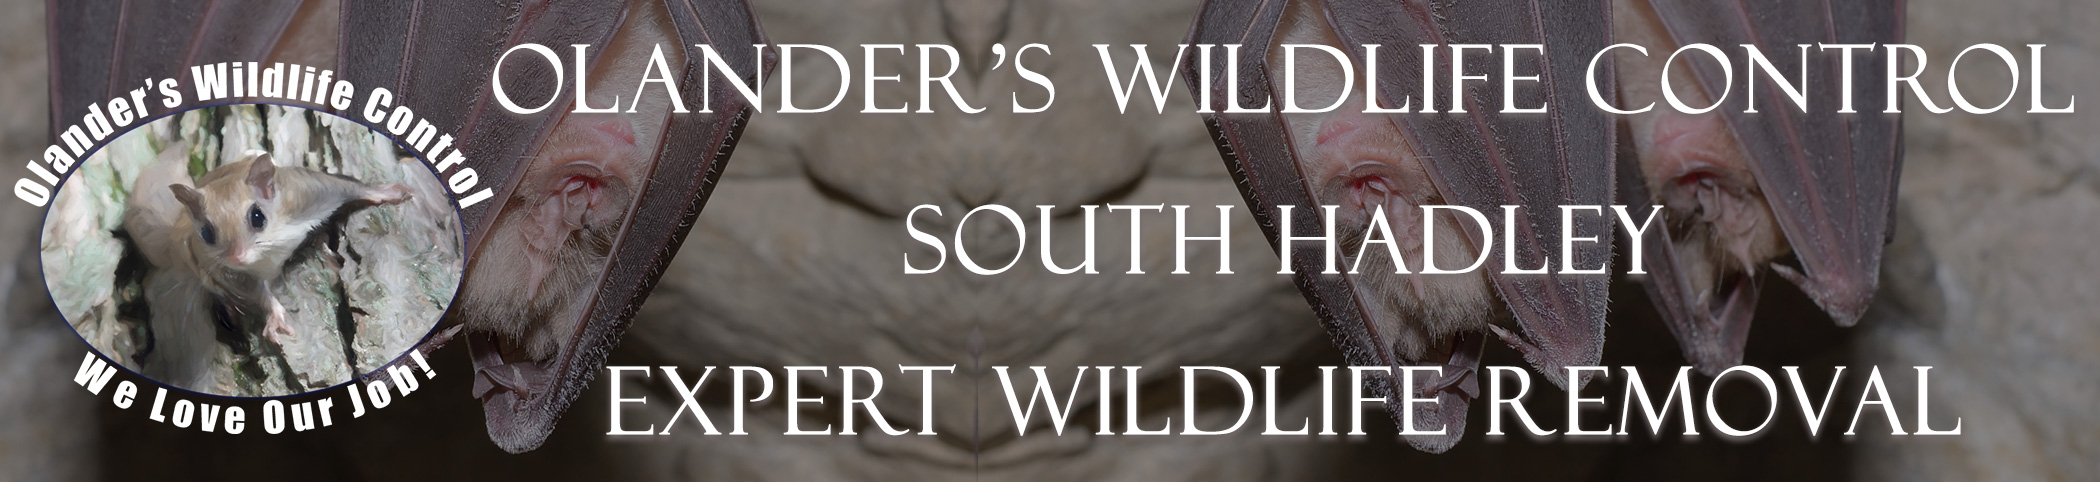 olanders-wildlife-control-South Hadley-mass-header-image